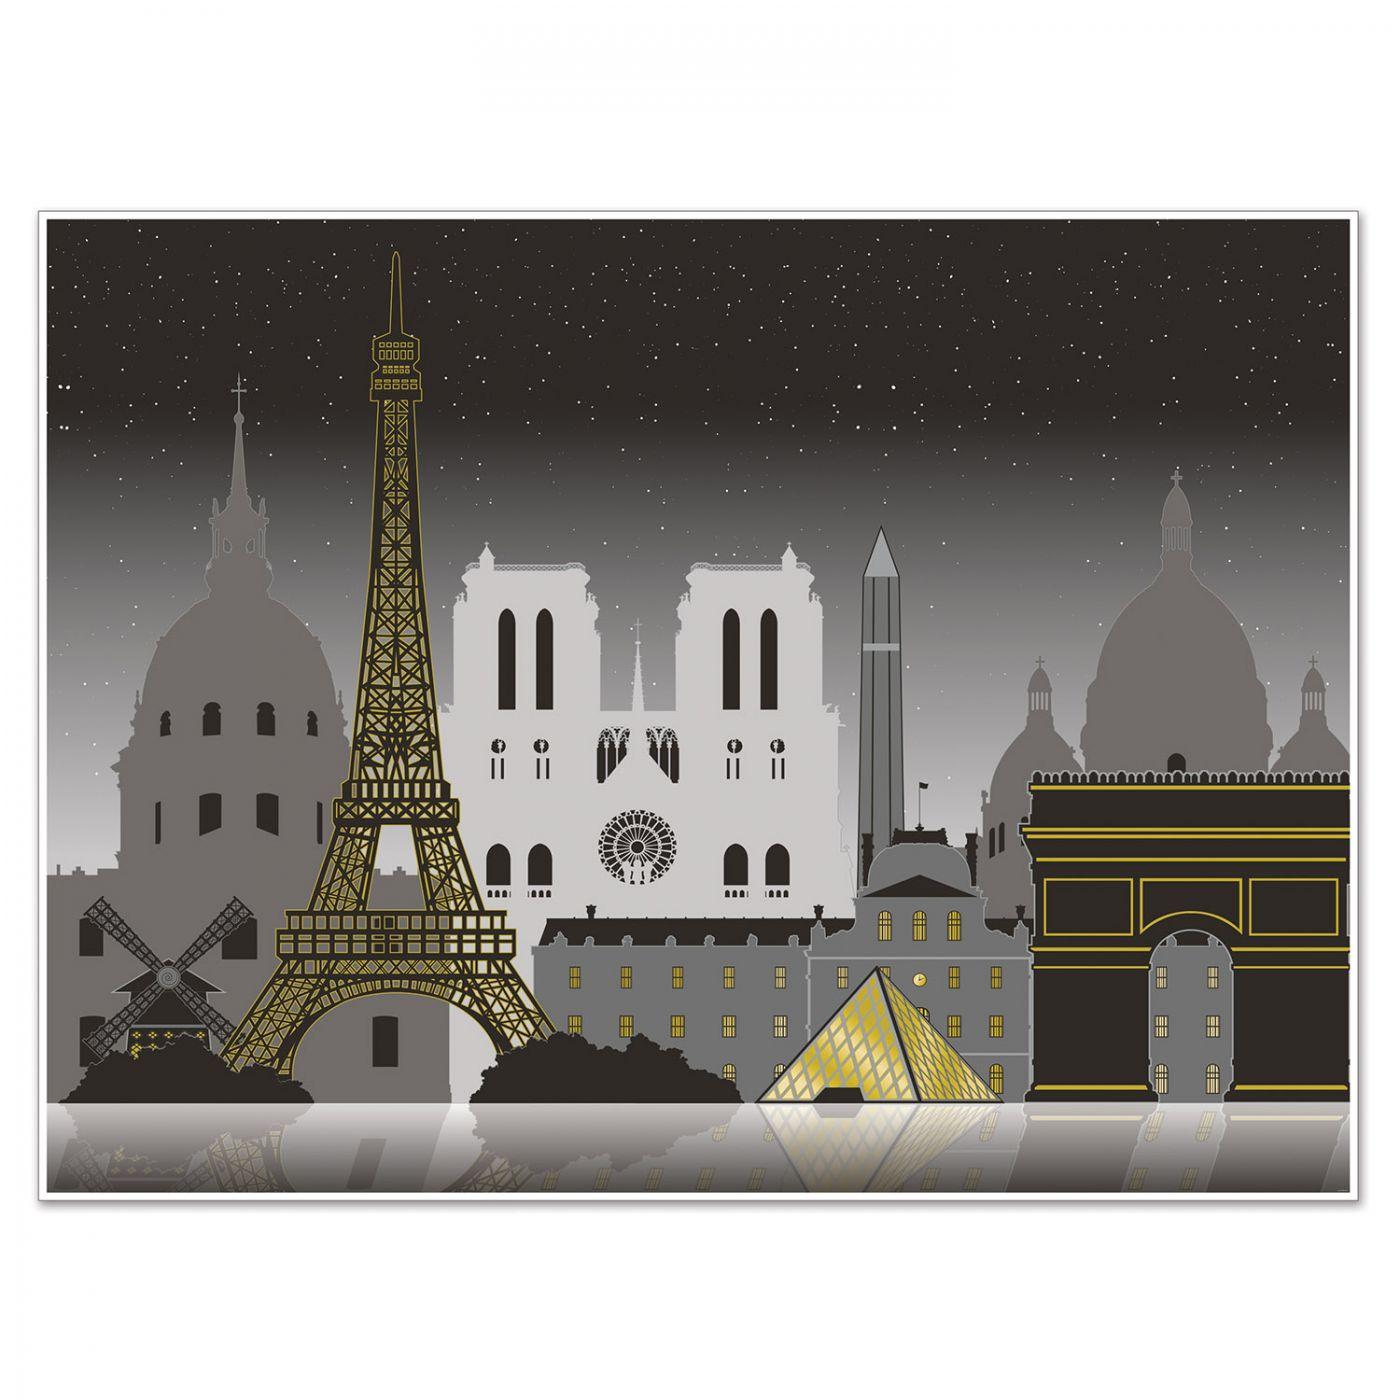 Paris Cityscape Insta-Mural (6) image